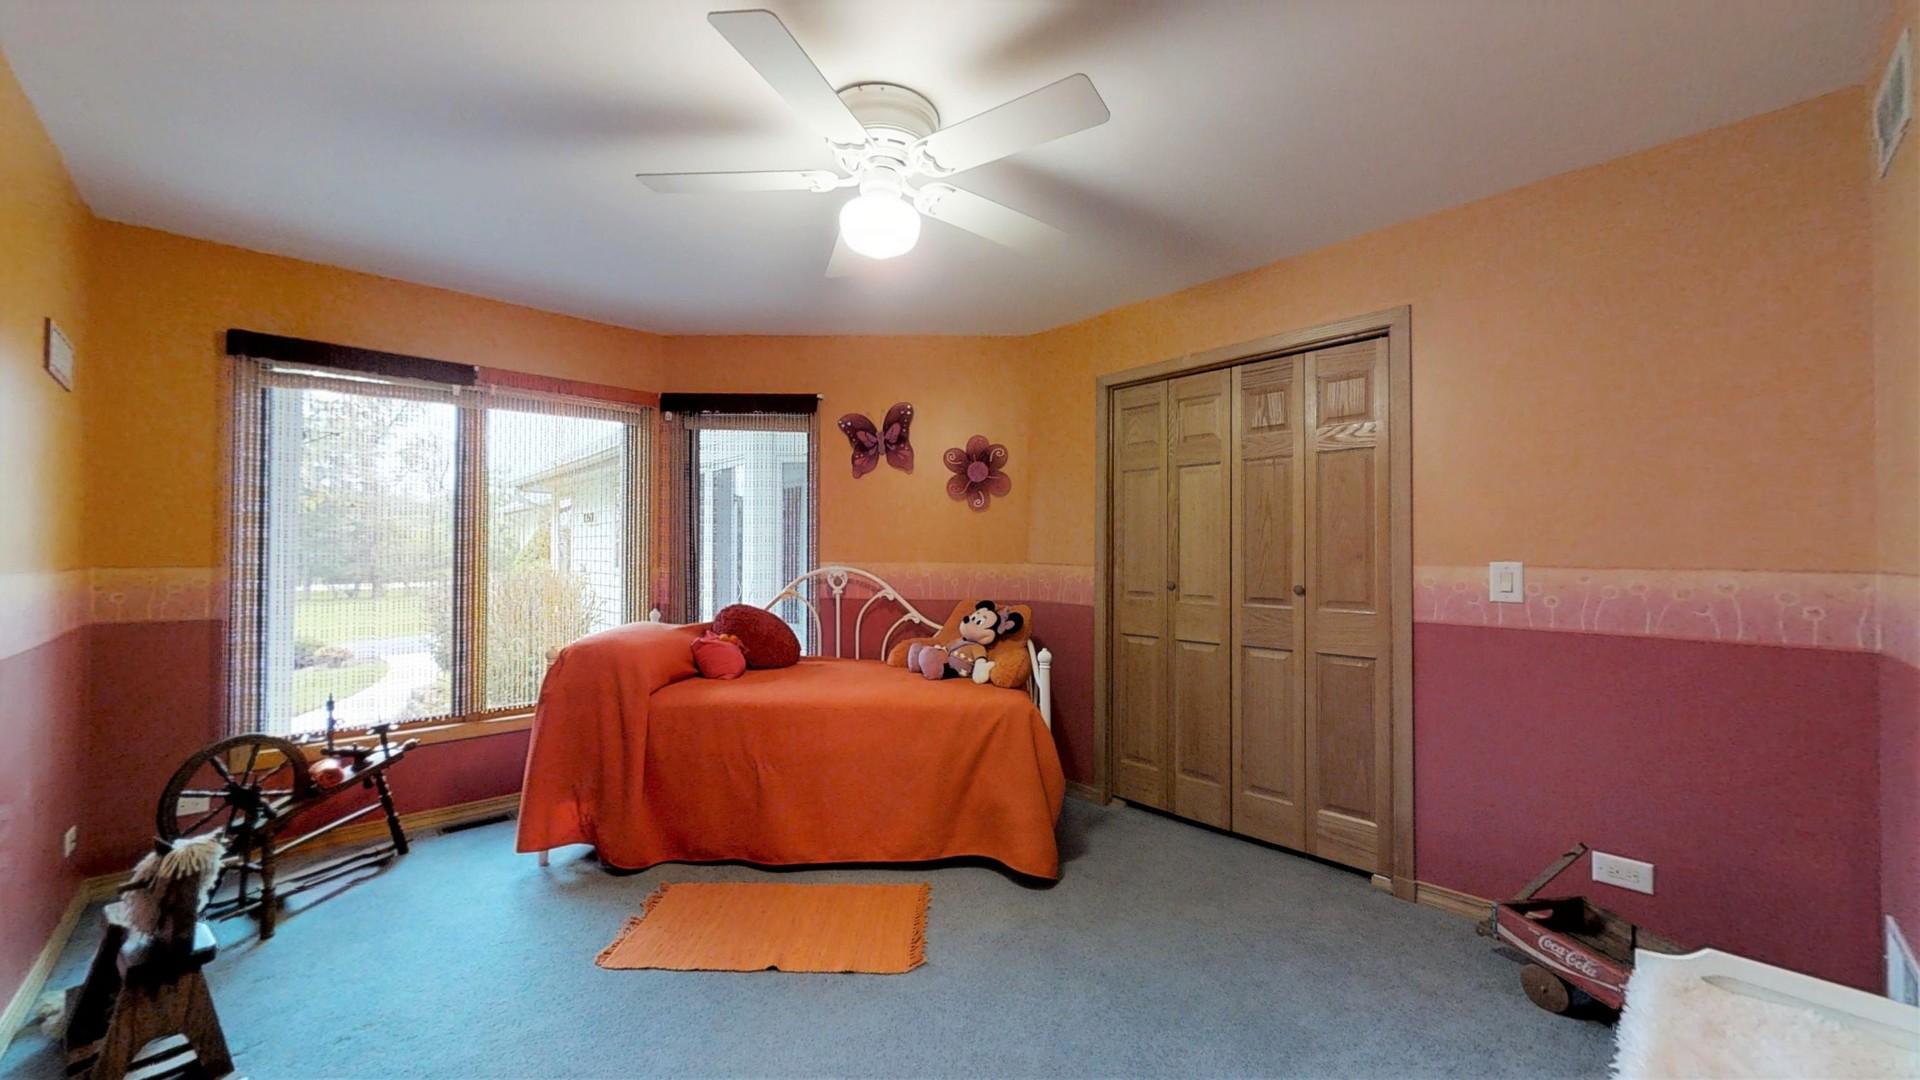 10601 Michigan, Spring Grove, Illinois, 60081